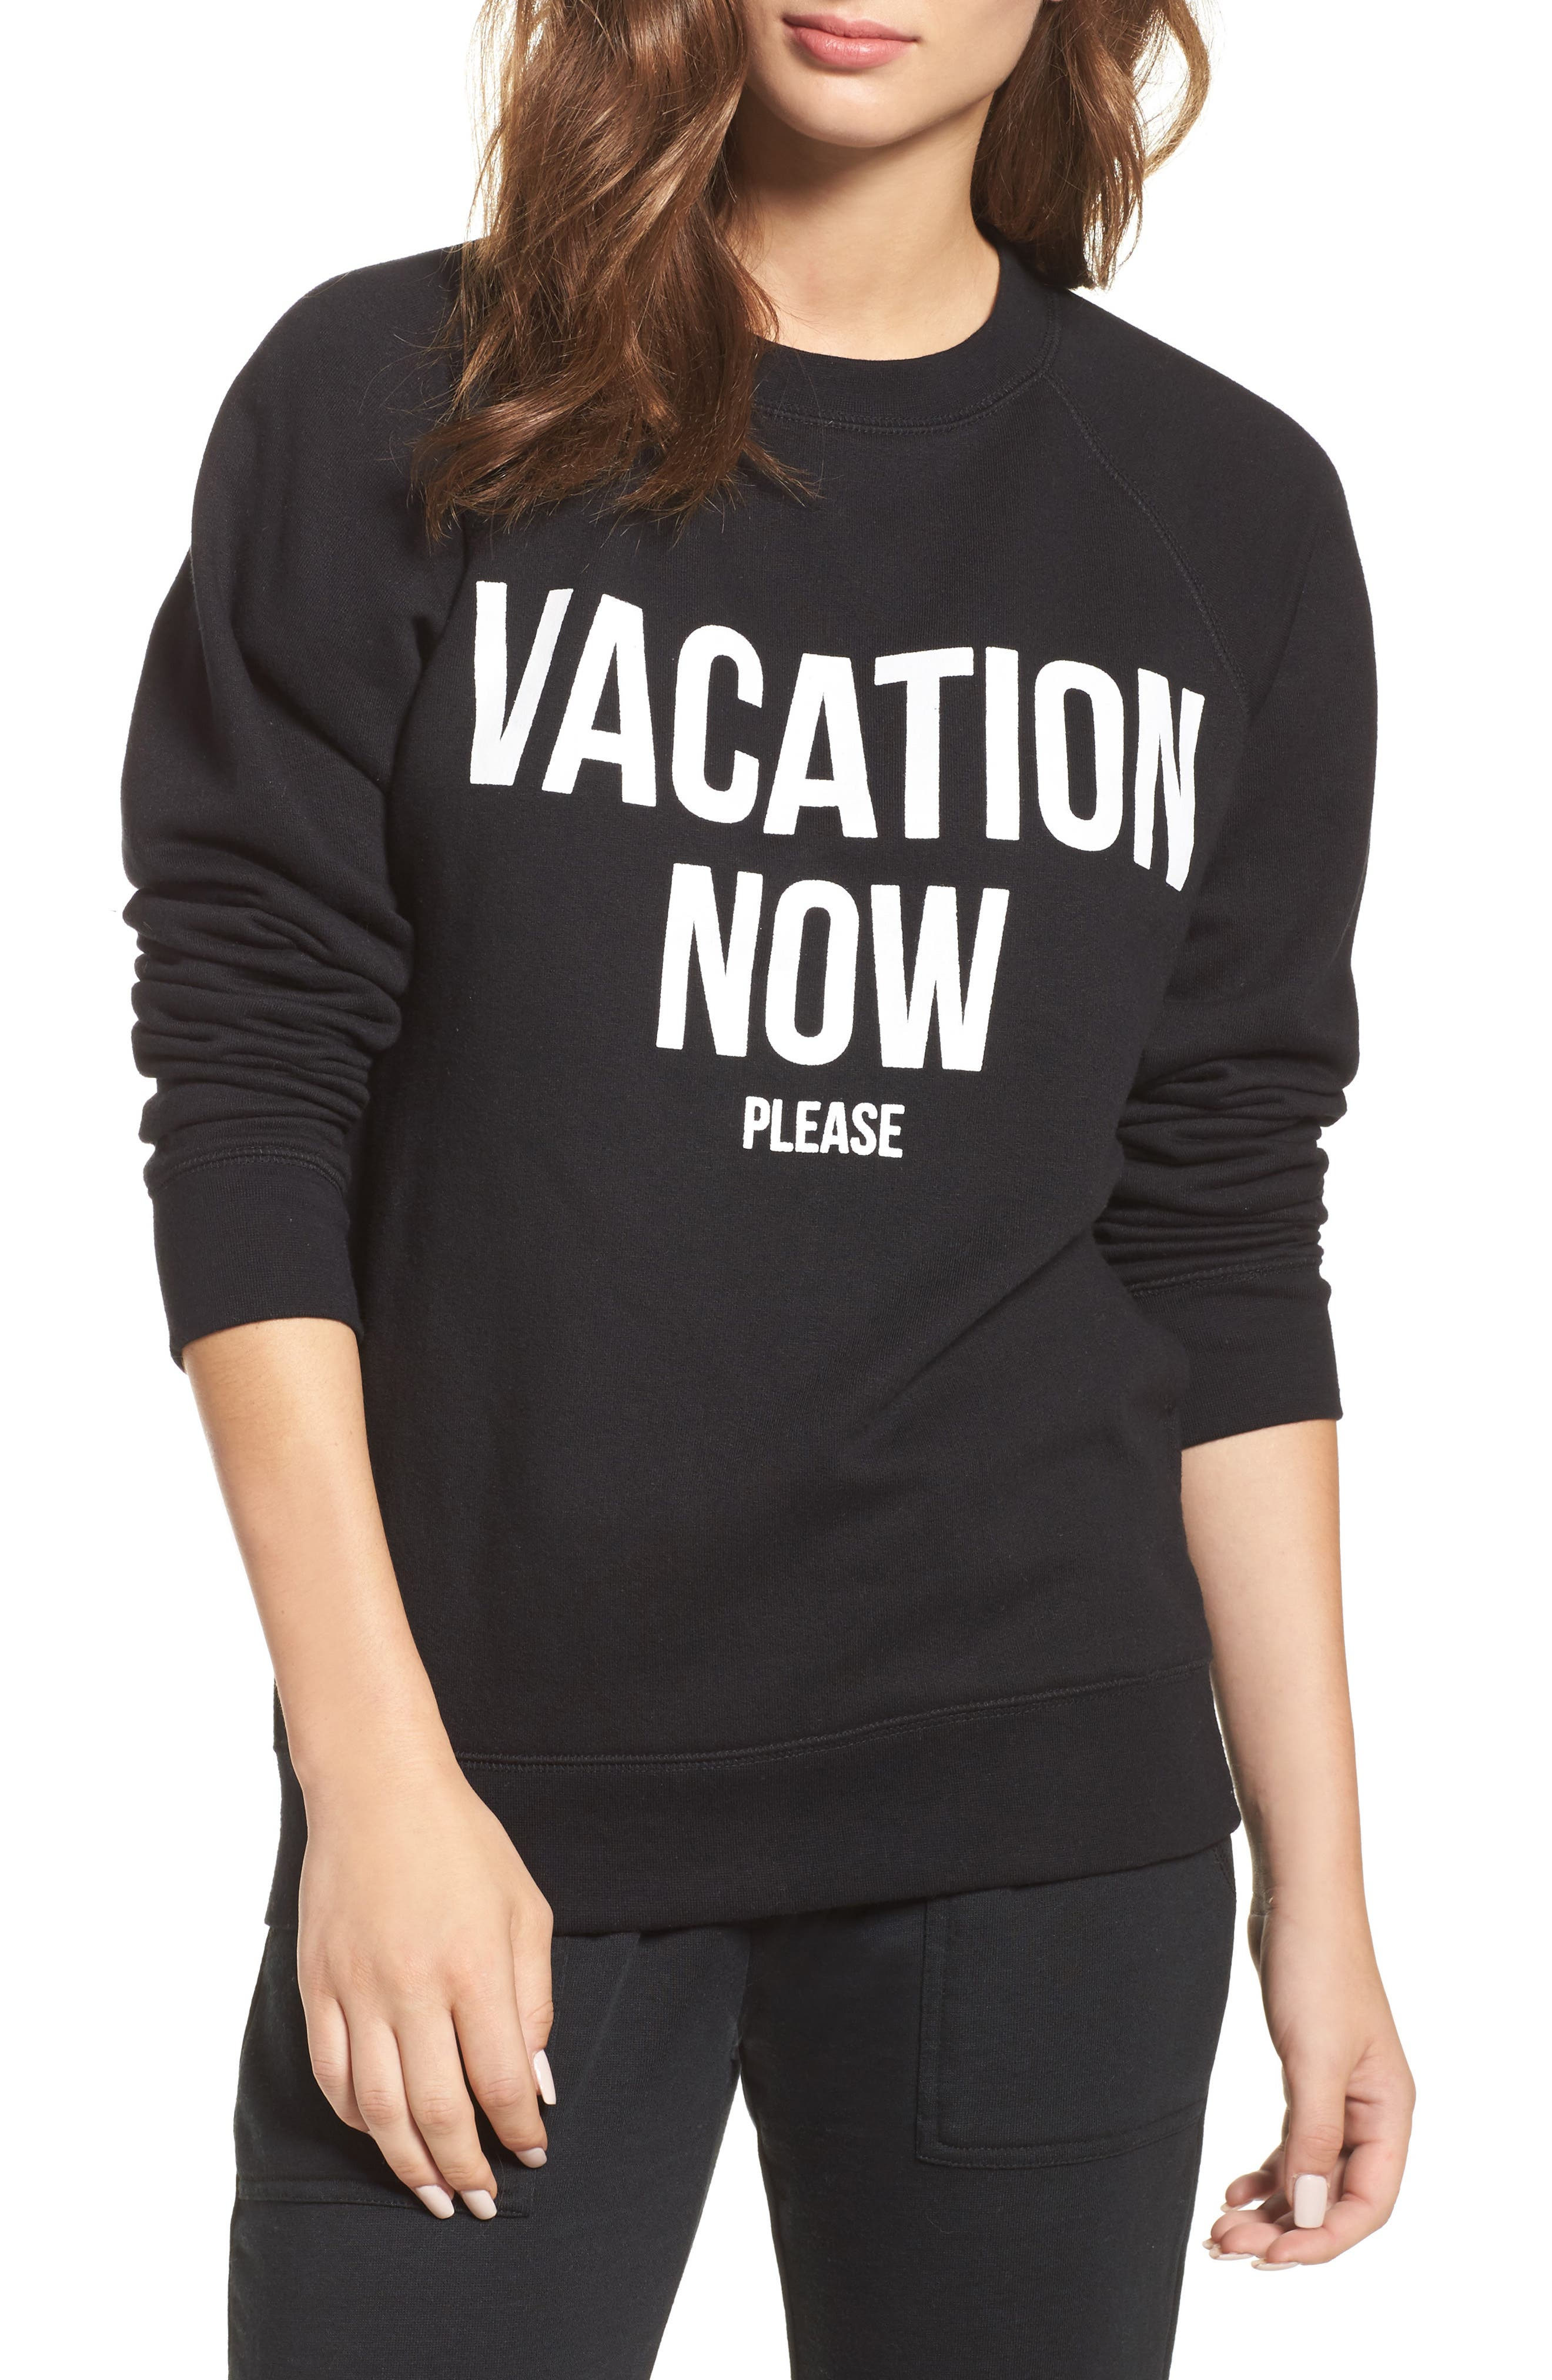 Vacation Now Sweatshirt,                         Main,                         color, 001